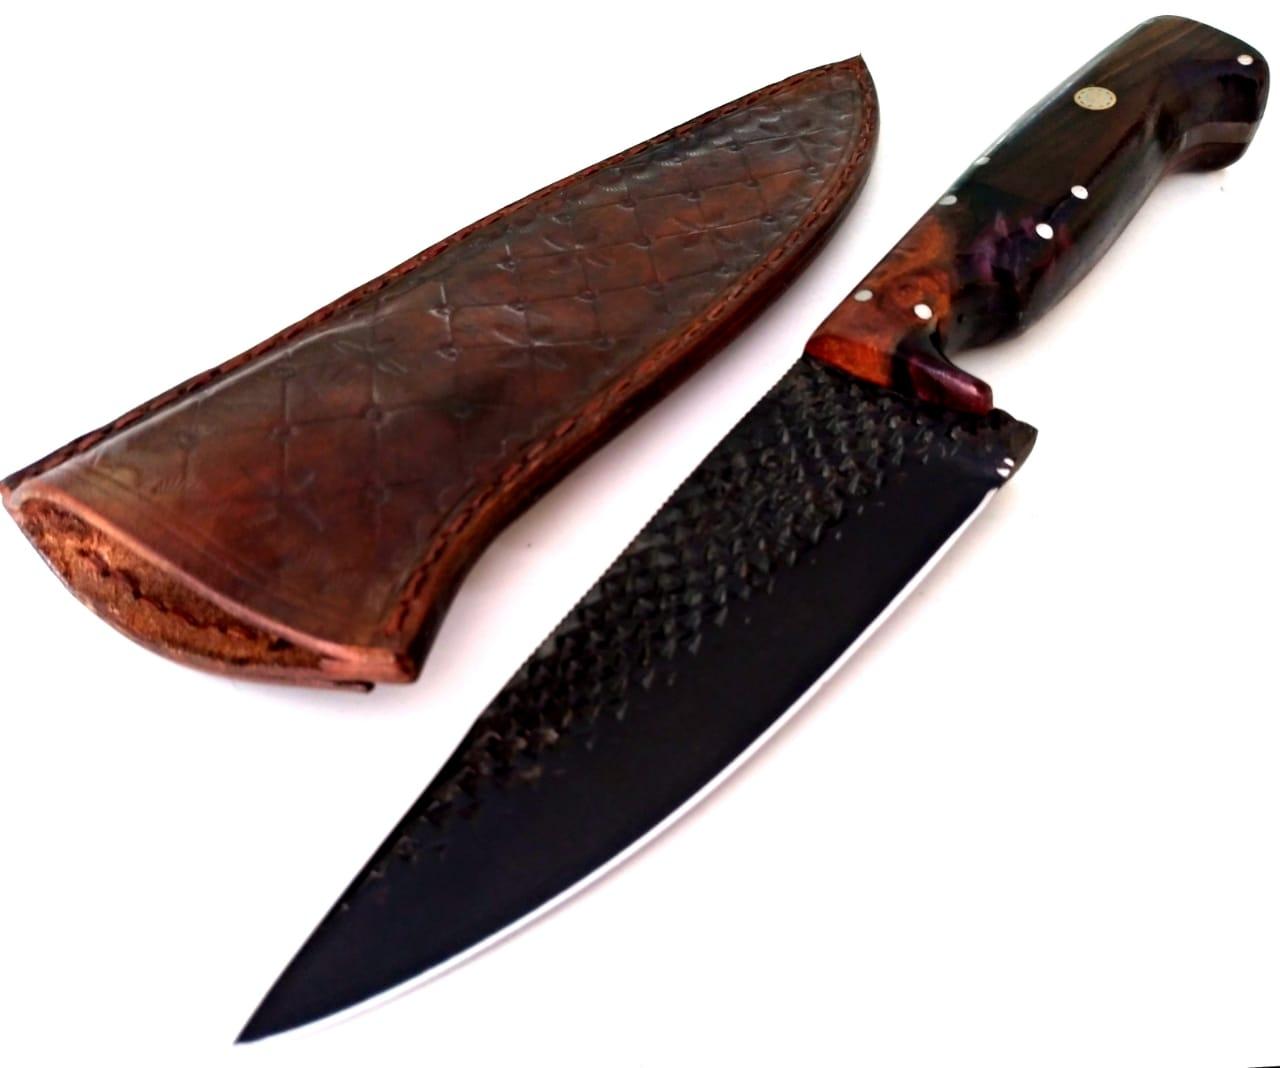 Faca artesanal negra forjada de antiga grosa de casquear full tang 6 polegadas